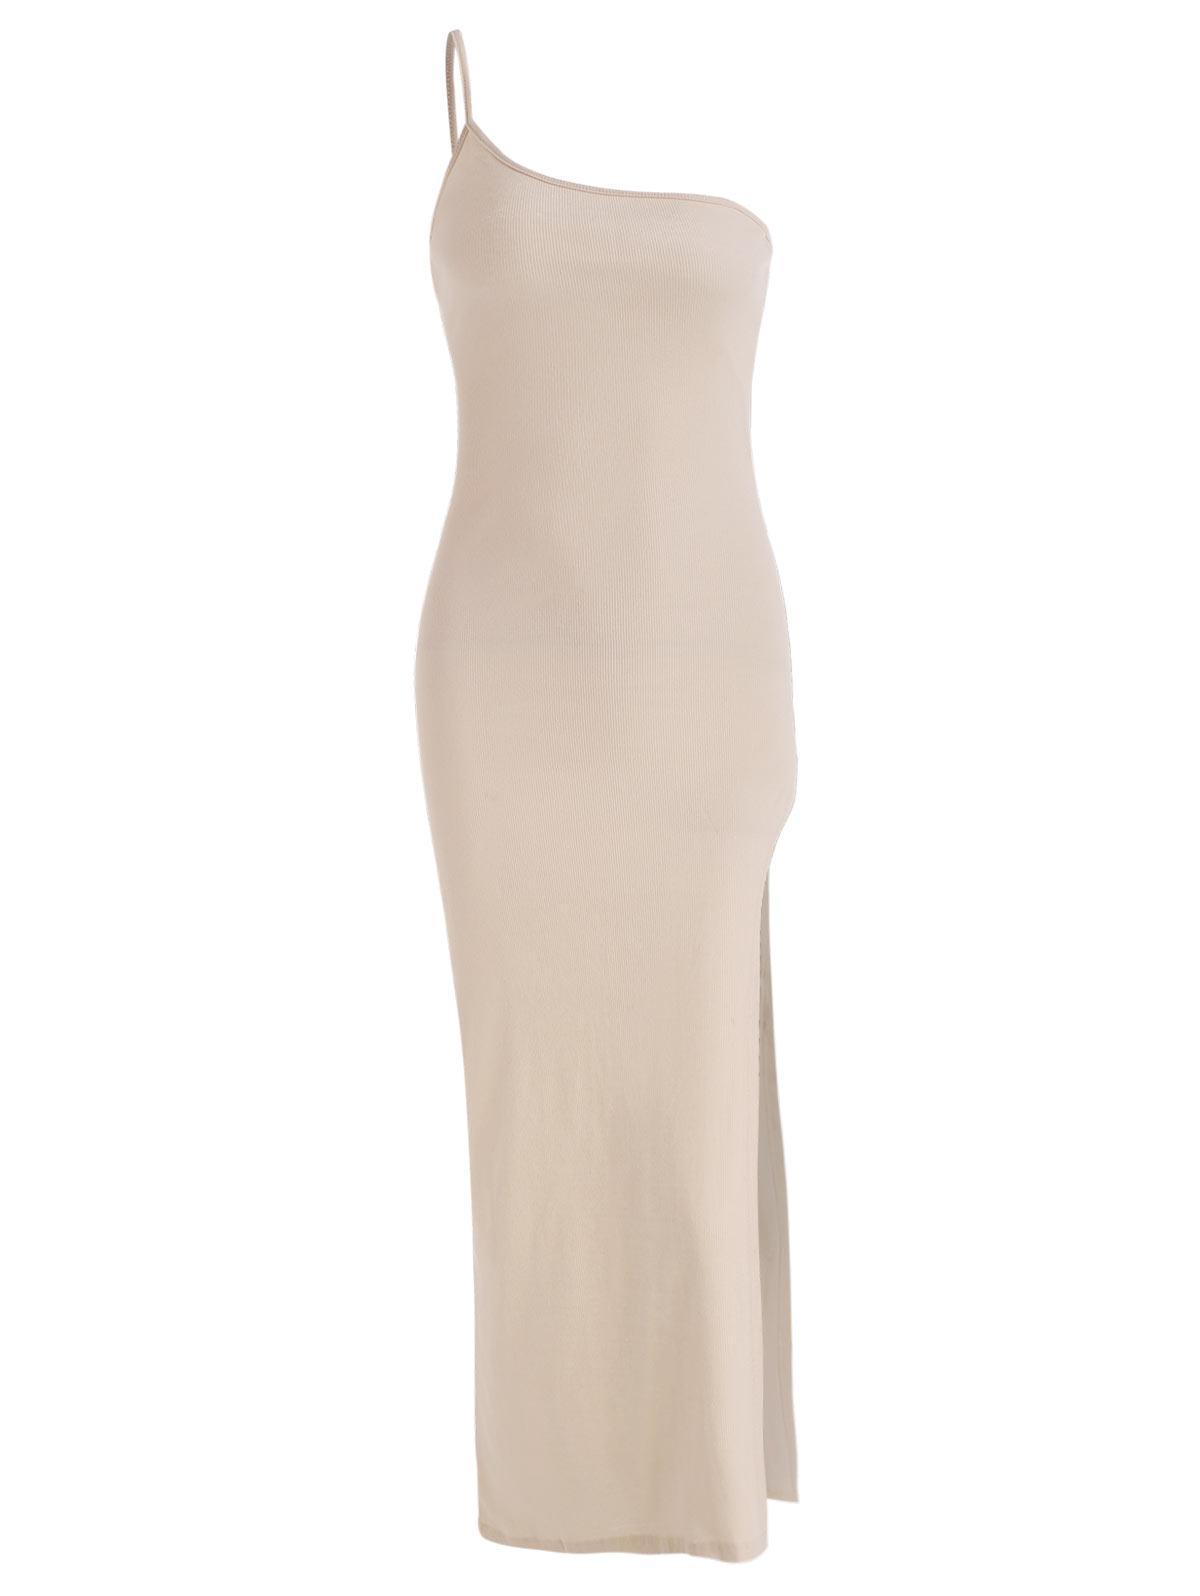 Ribbed One Shoulder Long Slit Bodycon Dress